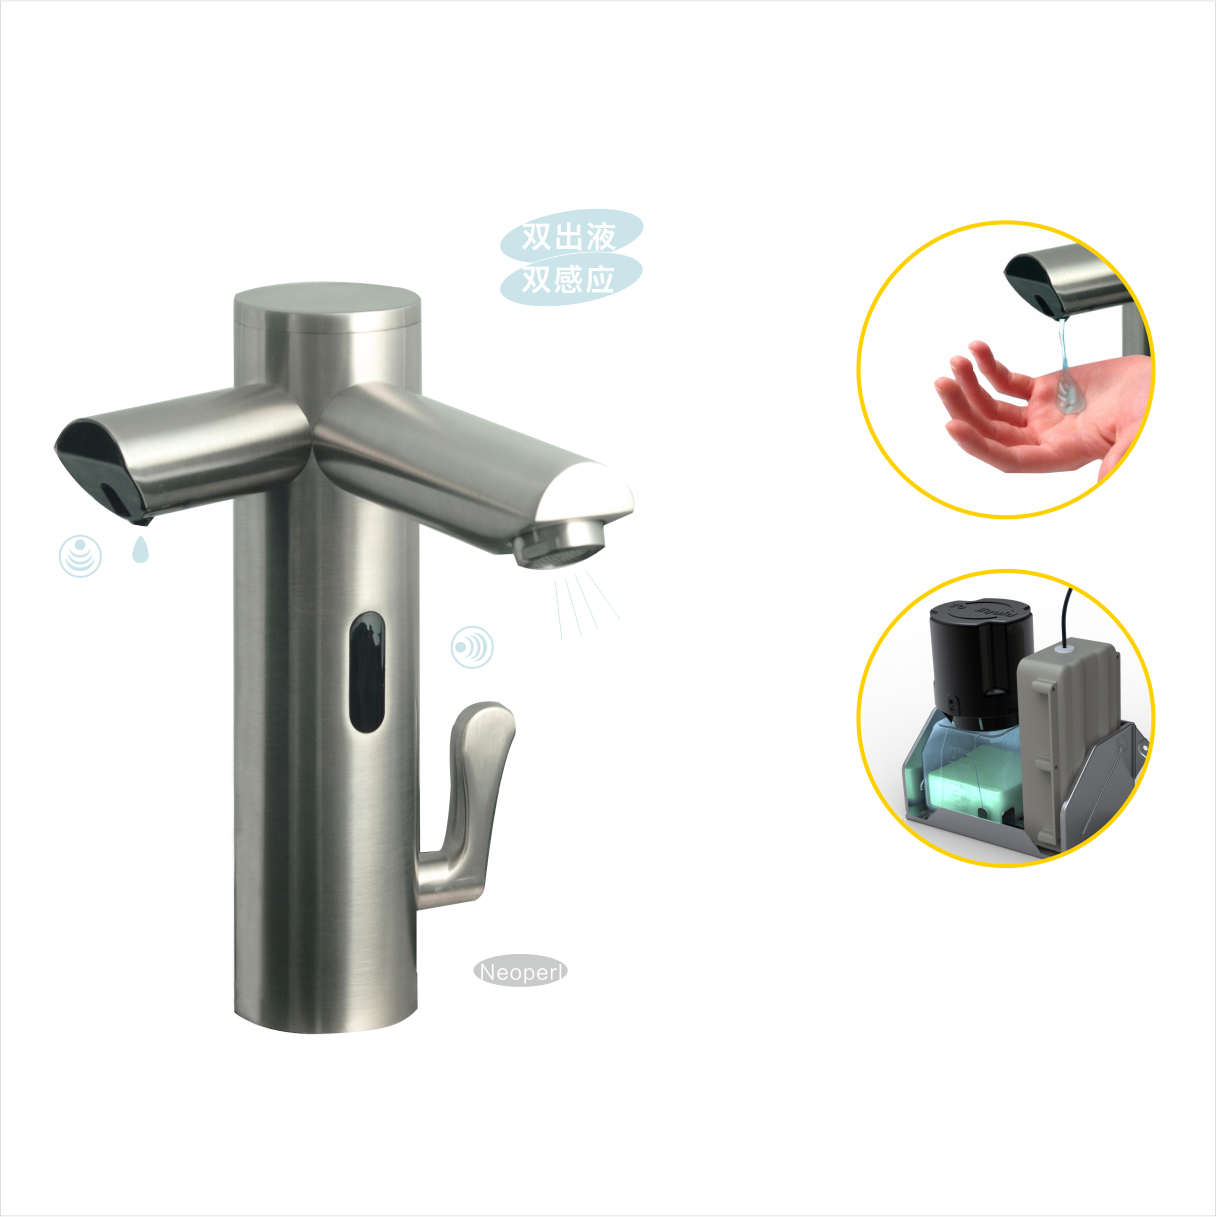 Sensor soap dispenser GBL-6108-01DZ